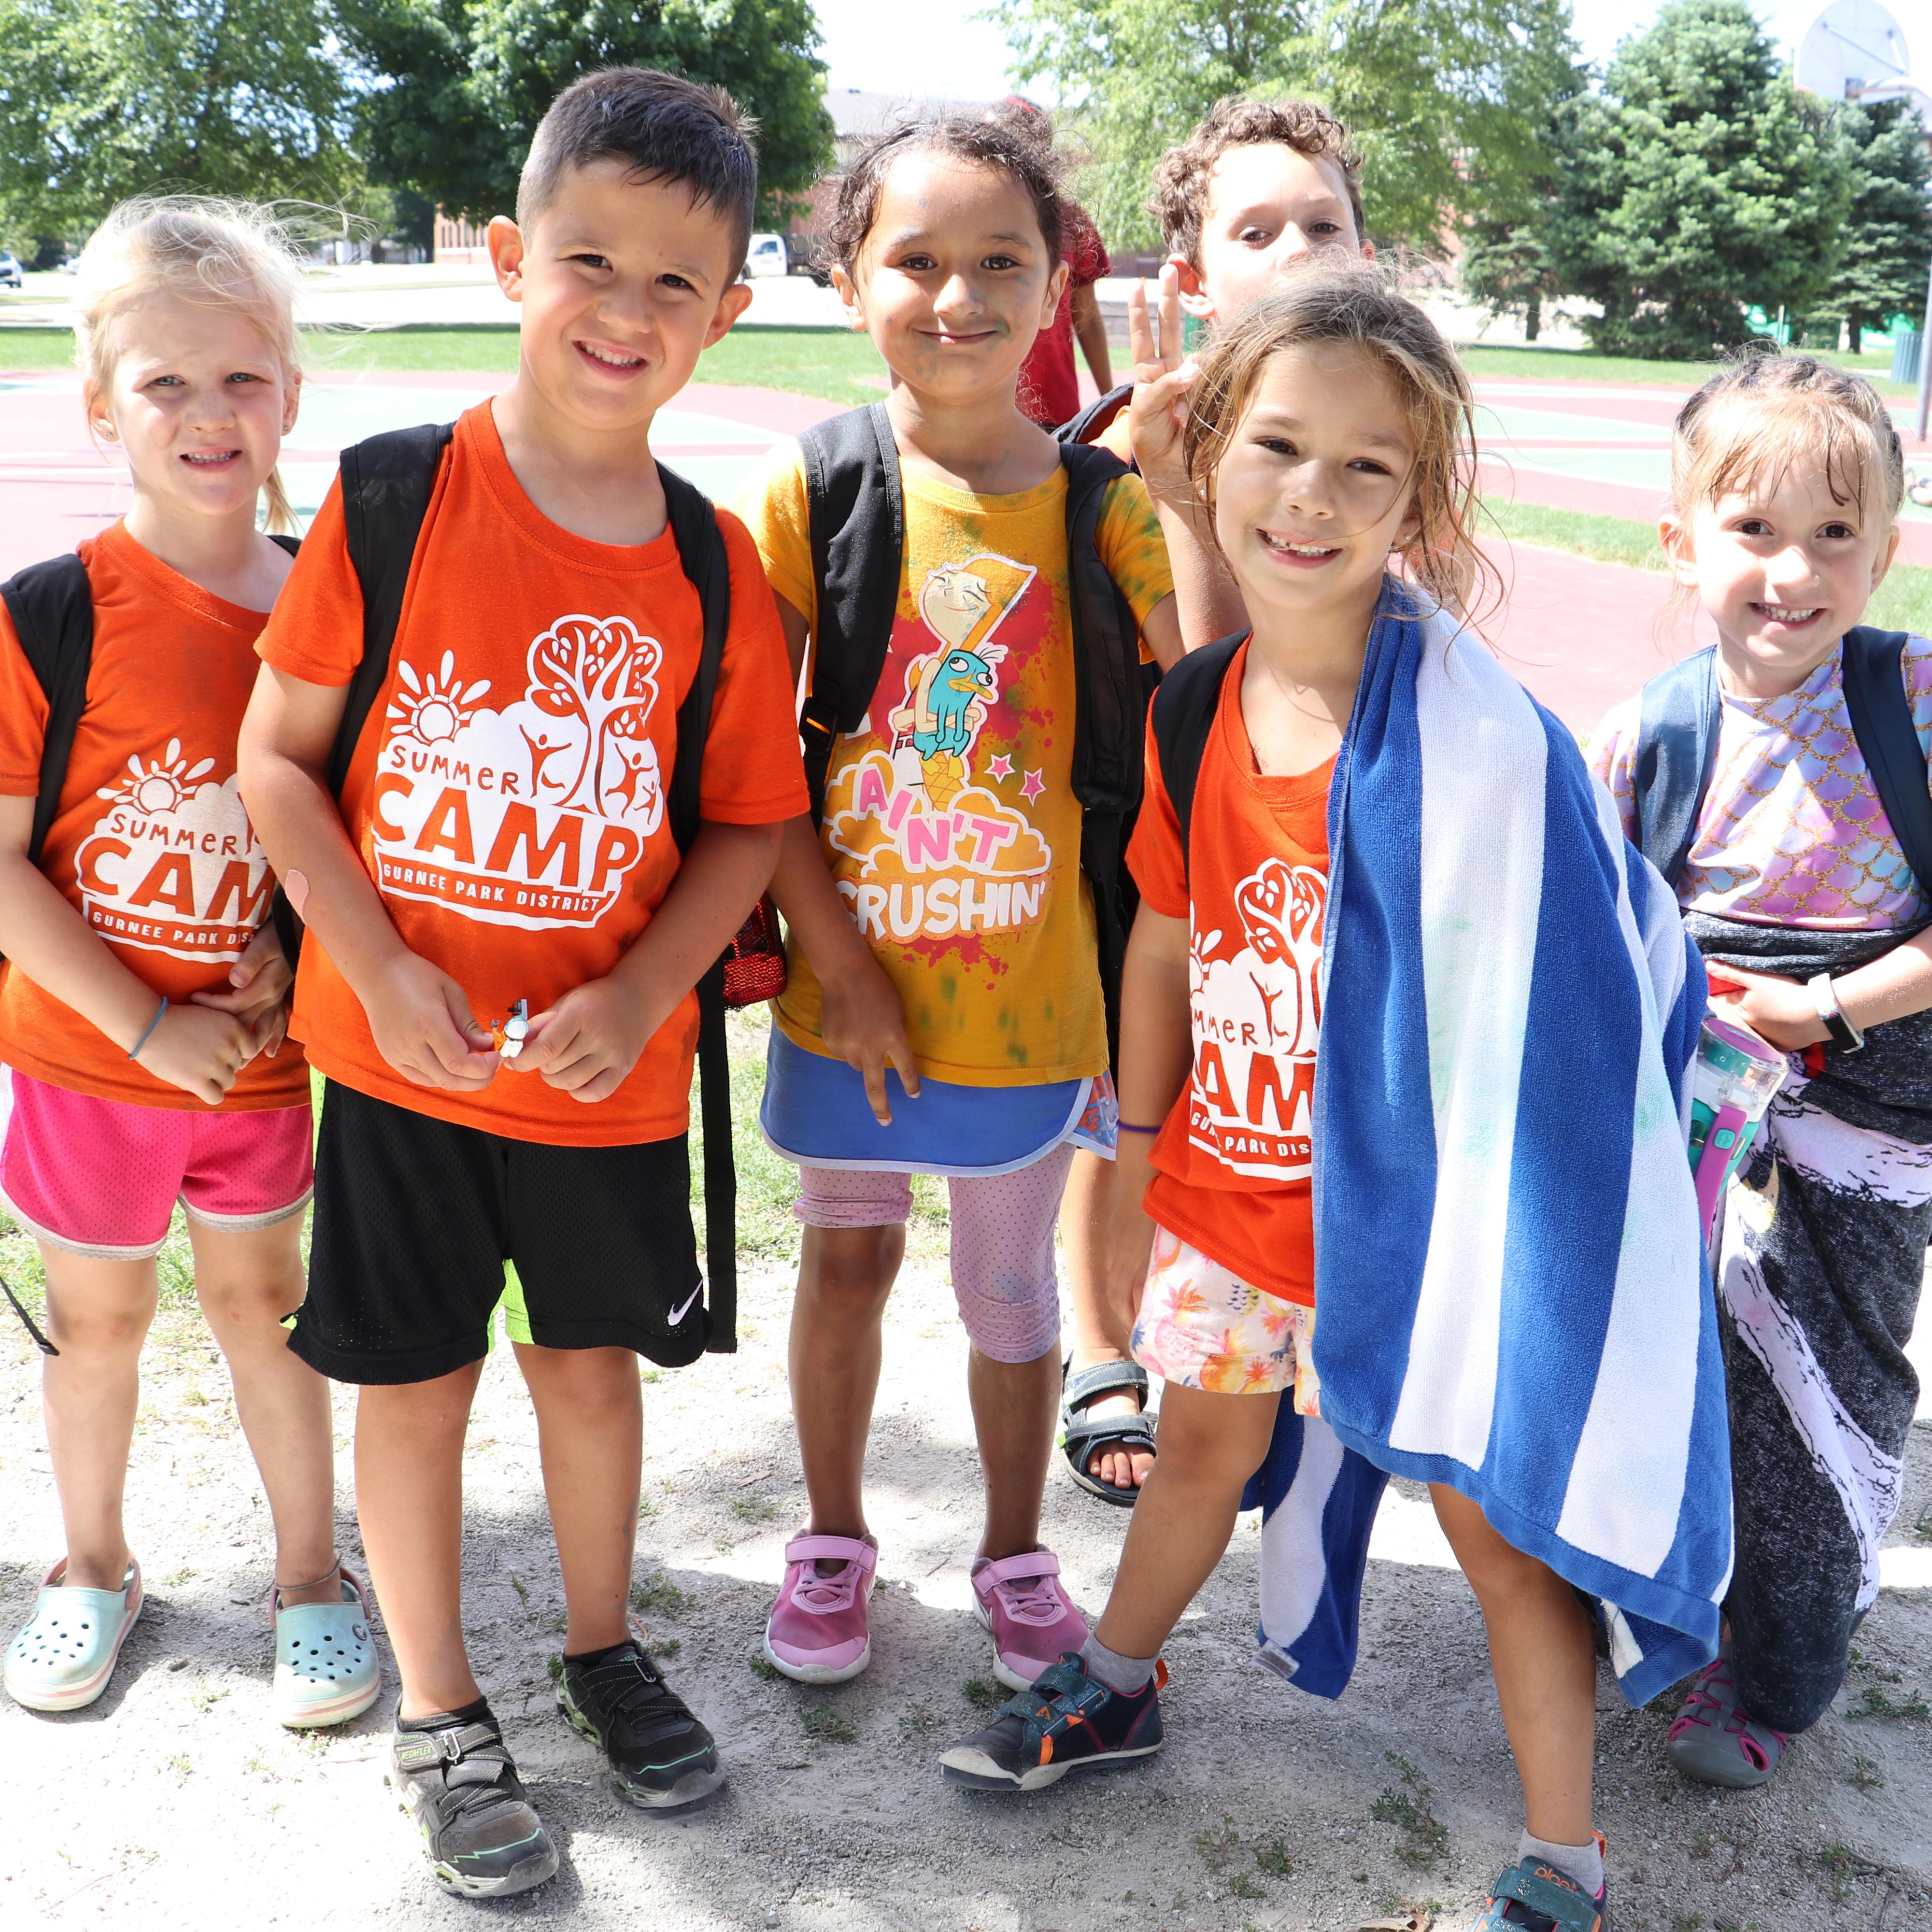 Summer camp in Gurnee